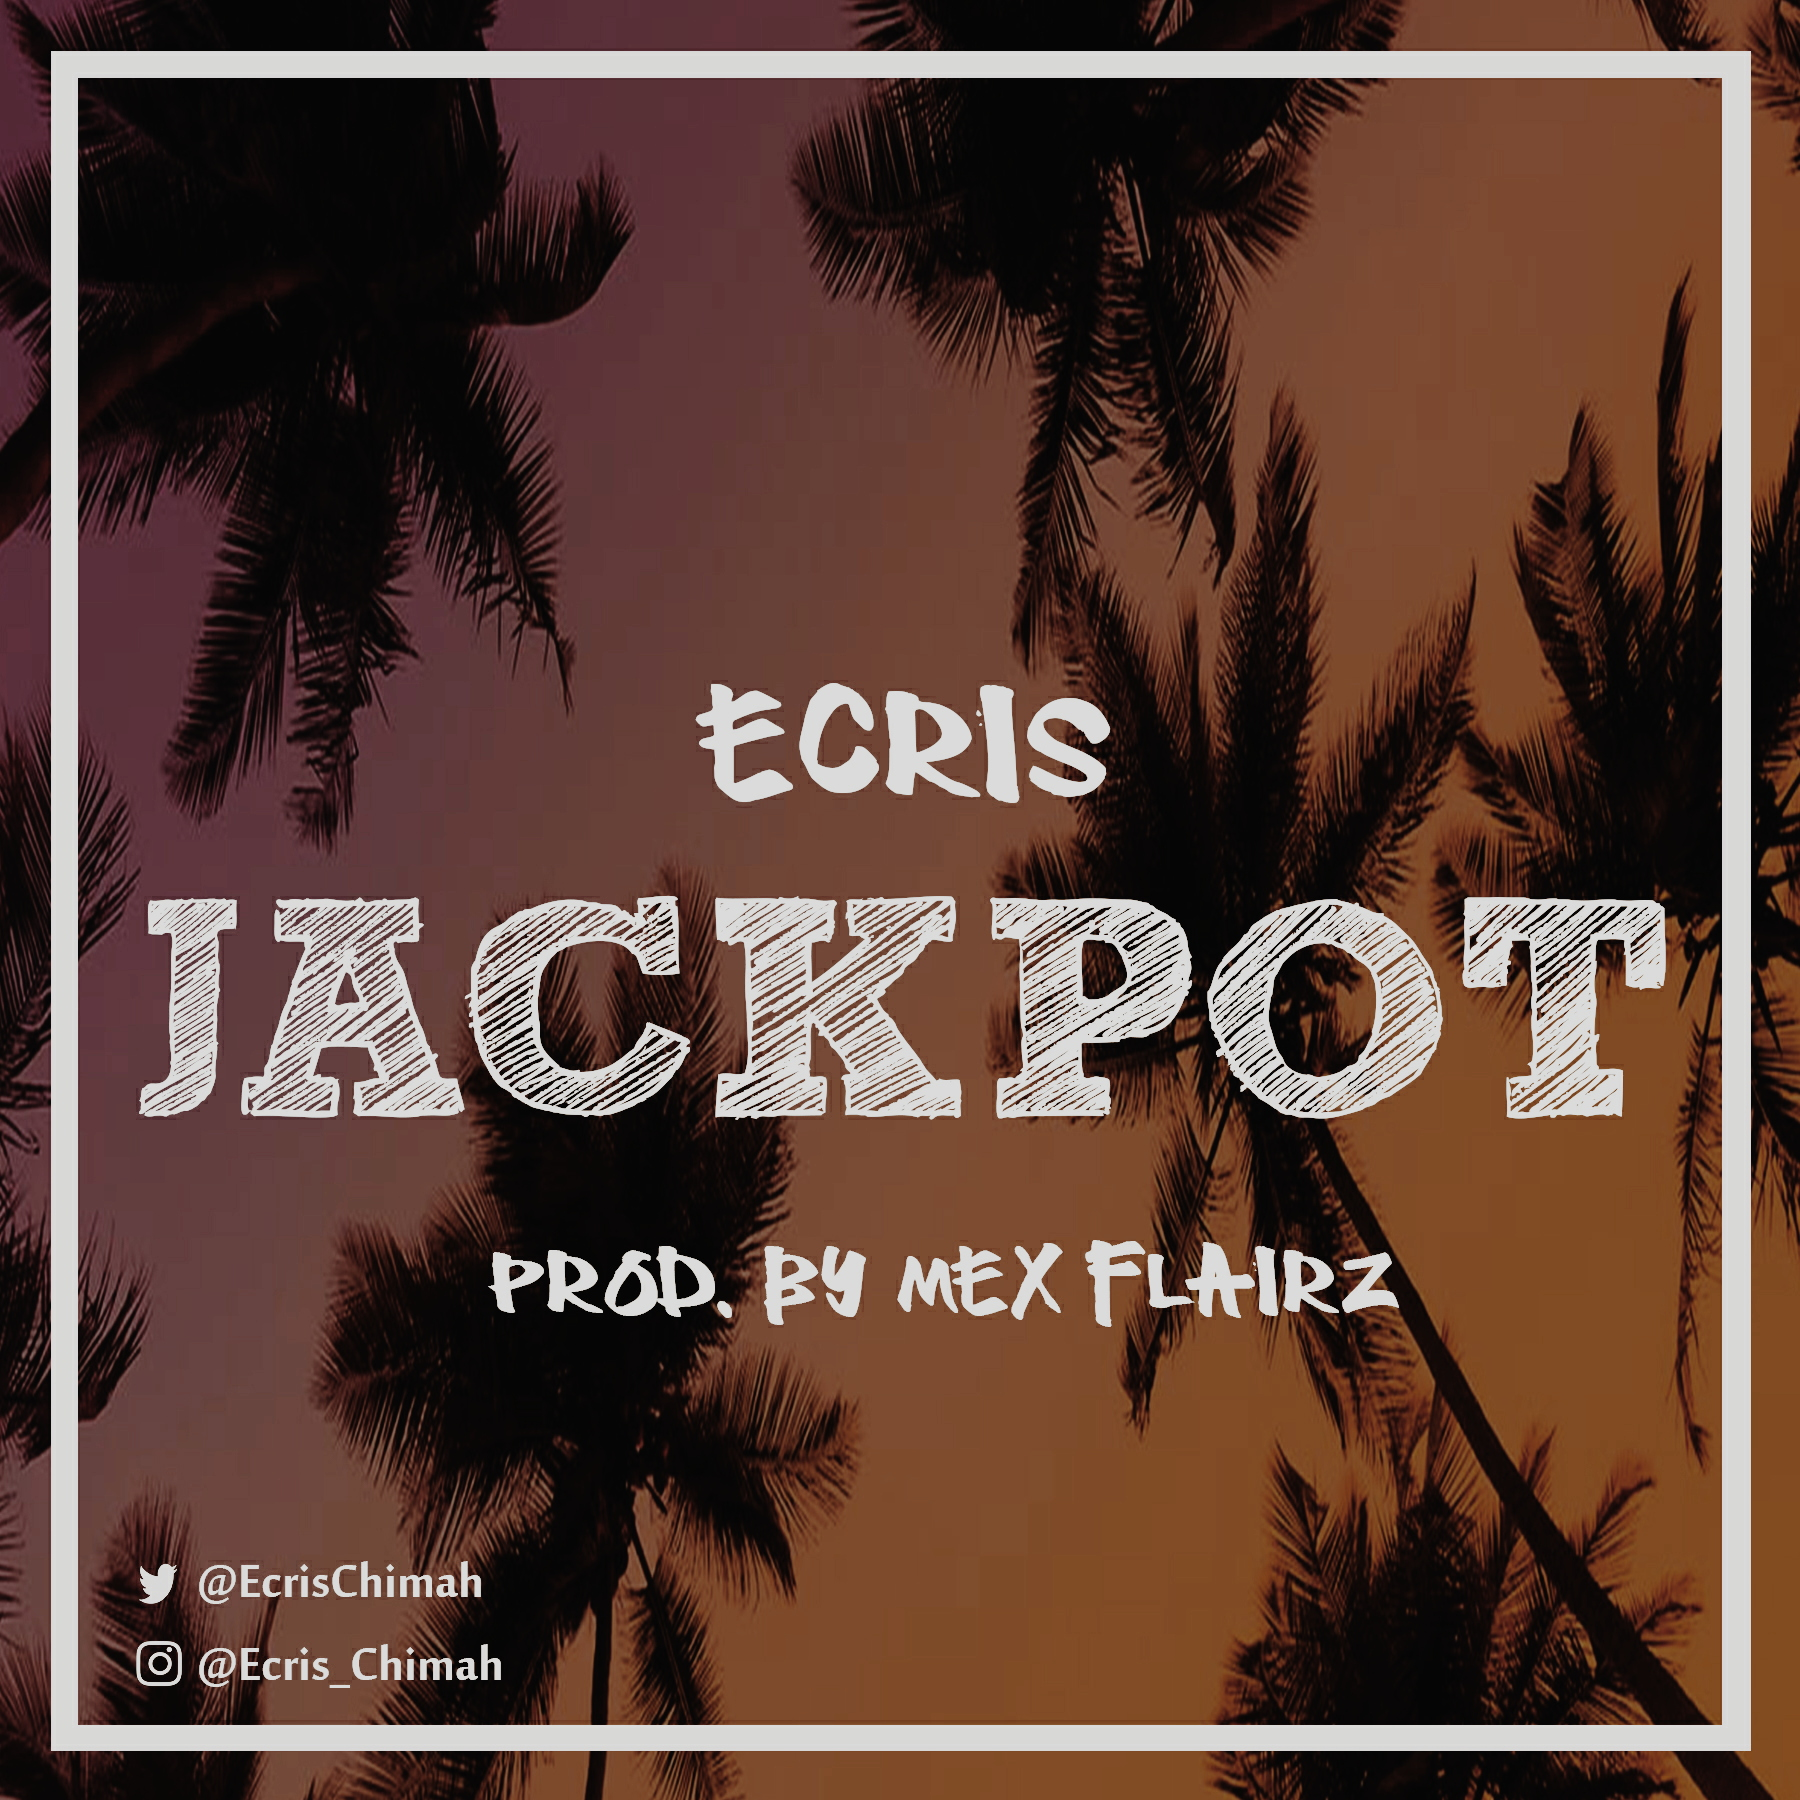 ECRIS – JACKPOT